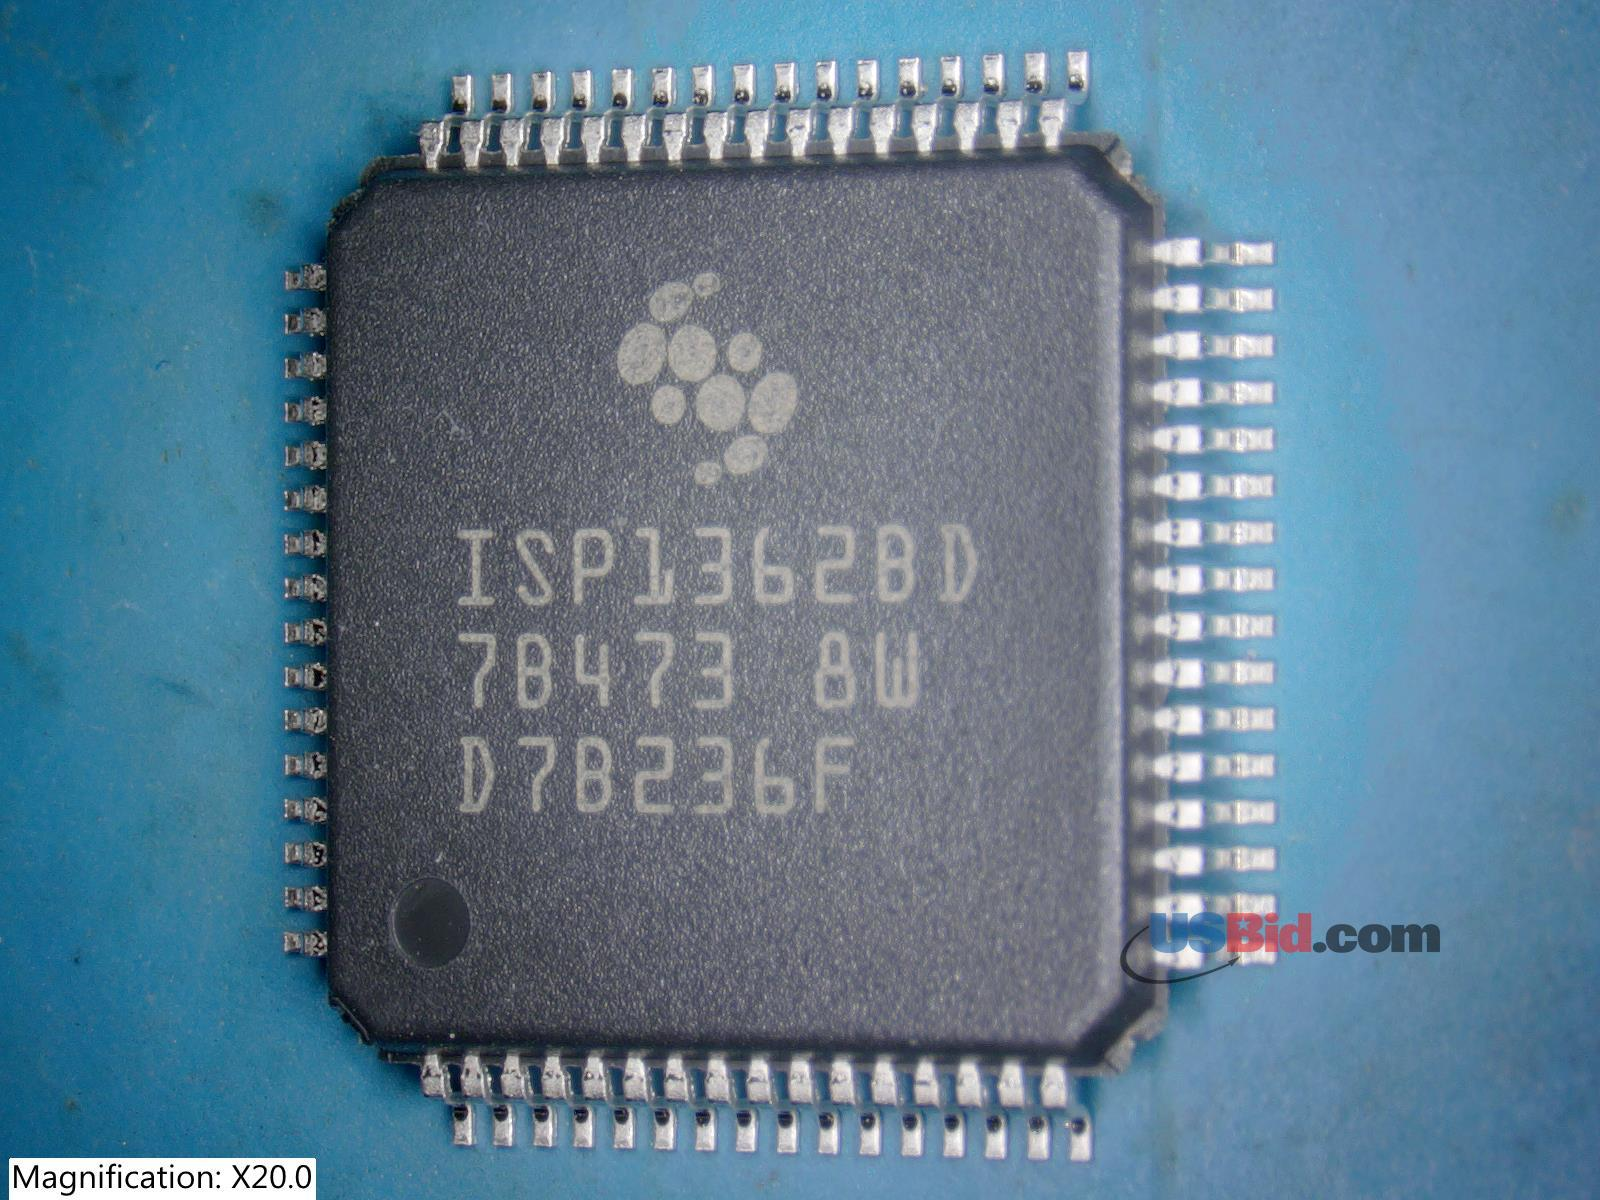 ISP1362BDFA